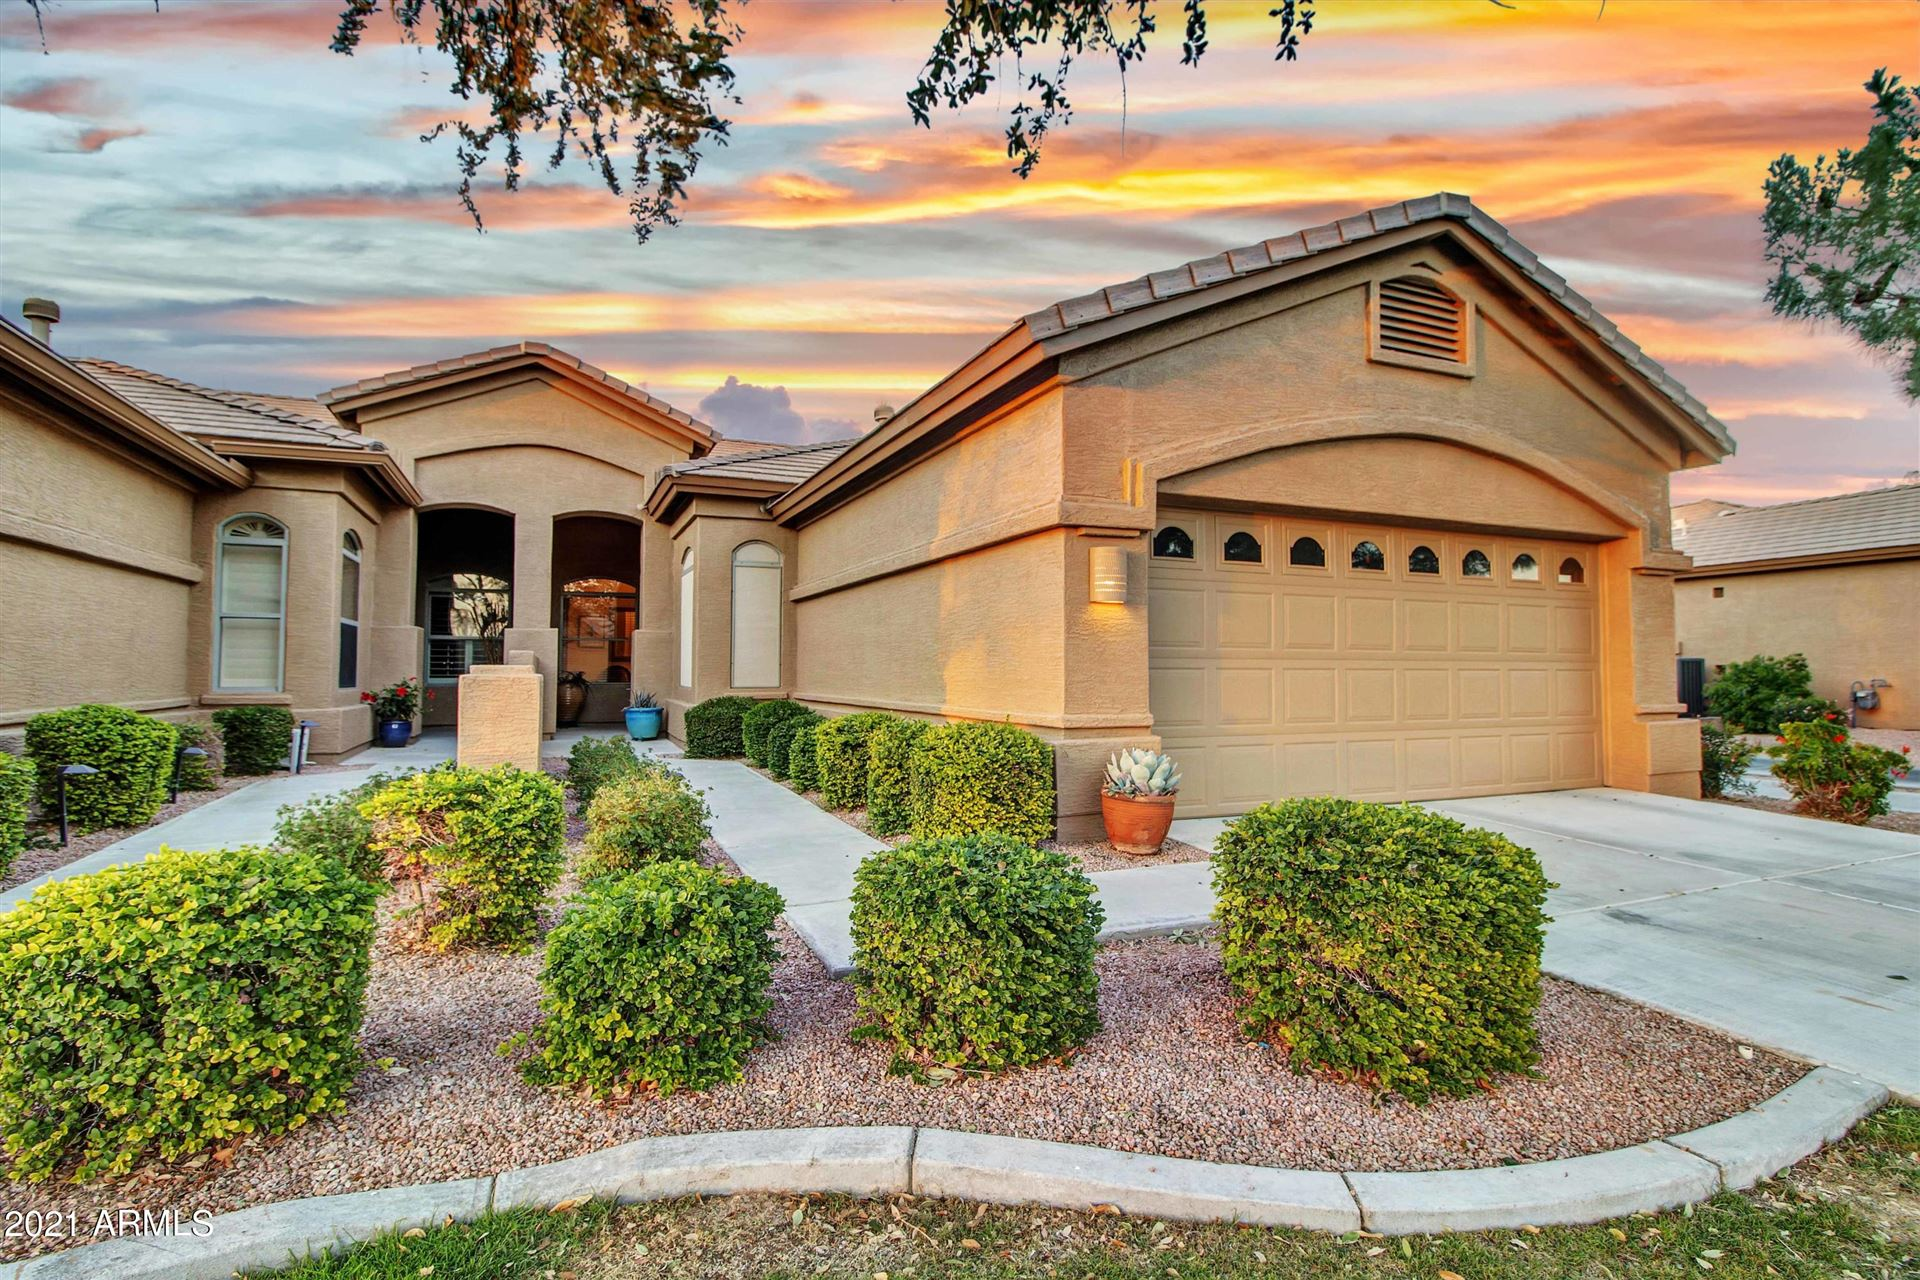 Photo of 9636 E ARROWVALE Drive, Sun Lakes, AZ 85248 (MLS # 6197337)